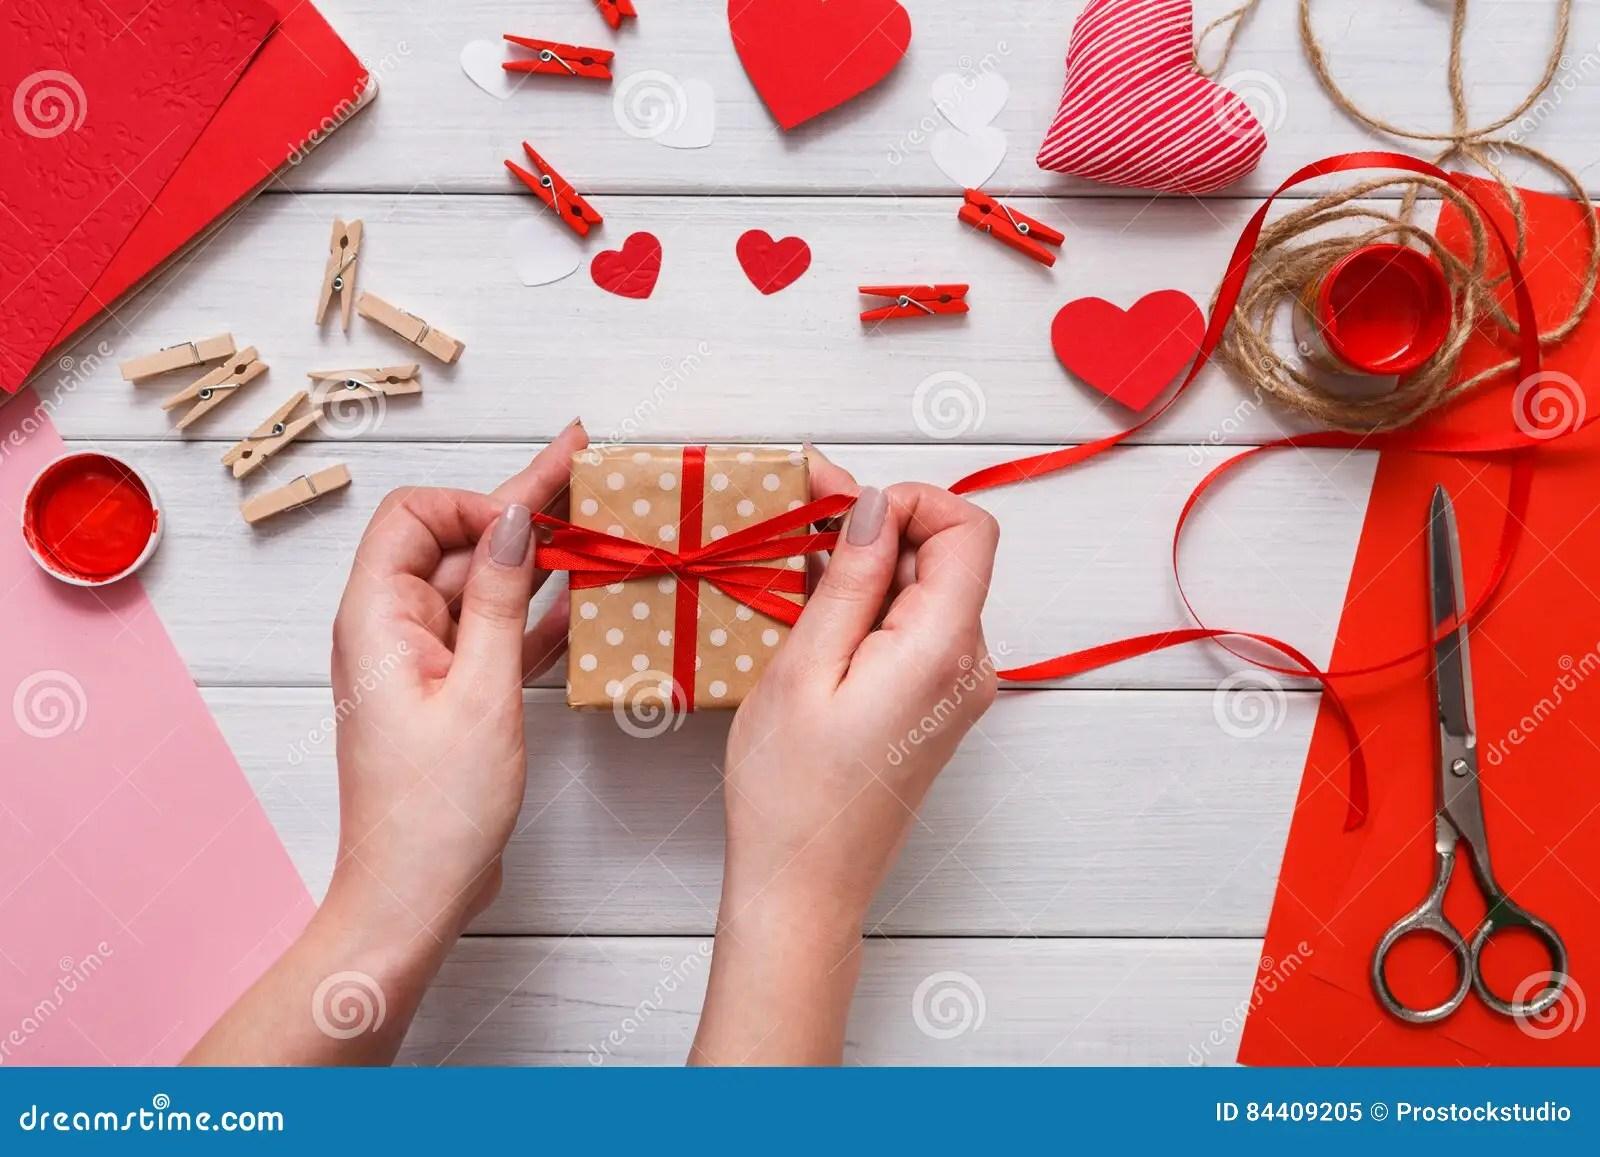 Valentine Day Handmade Present Background Cut And Paste